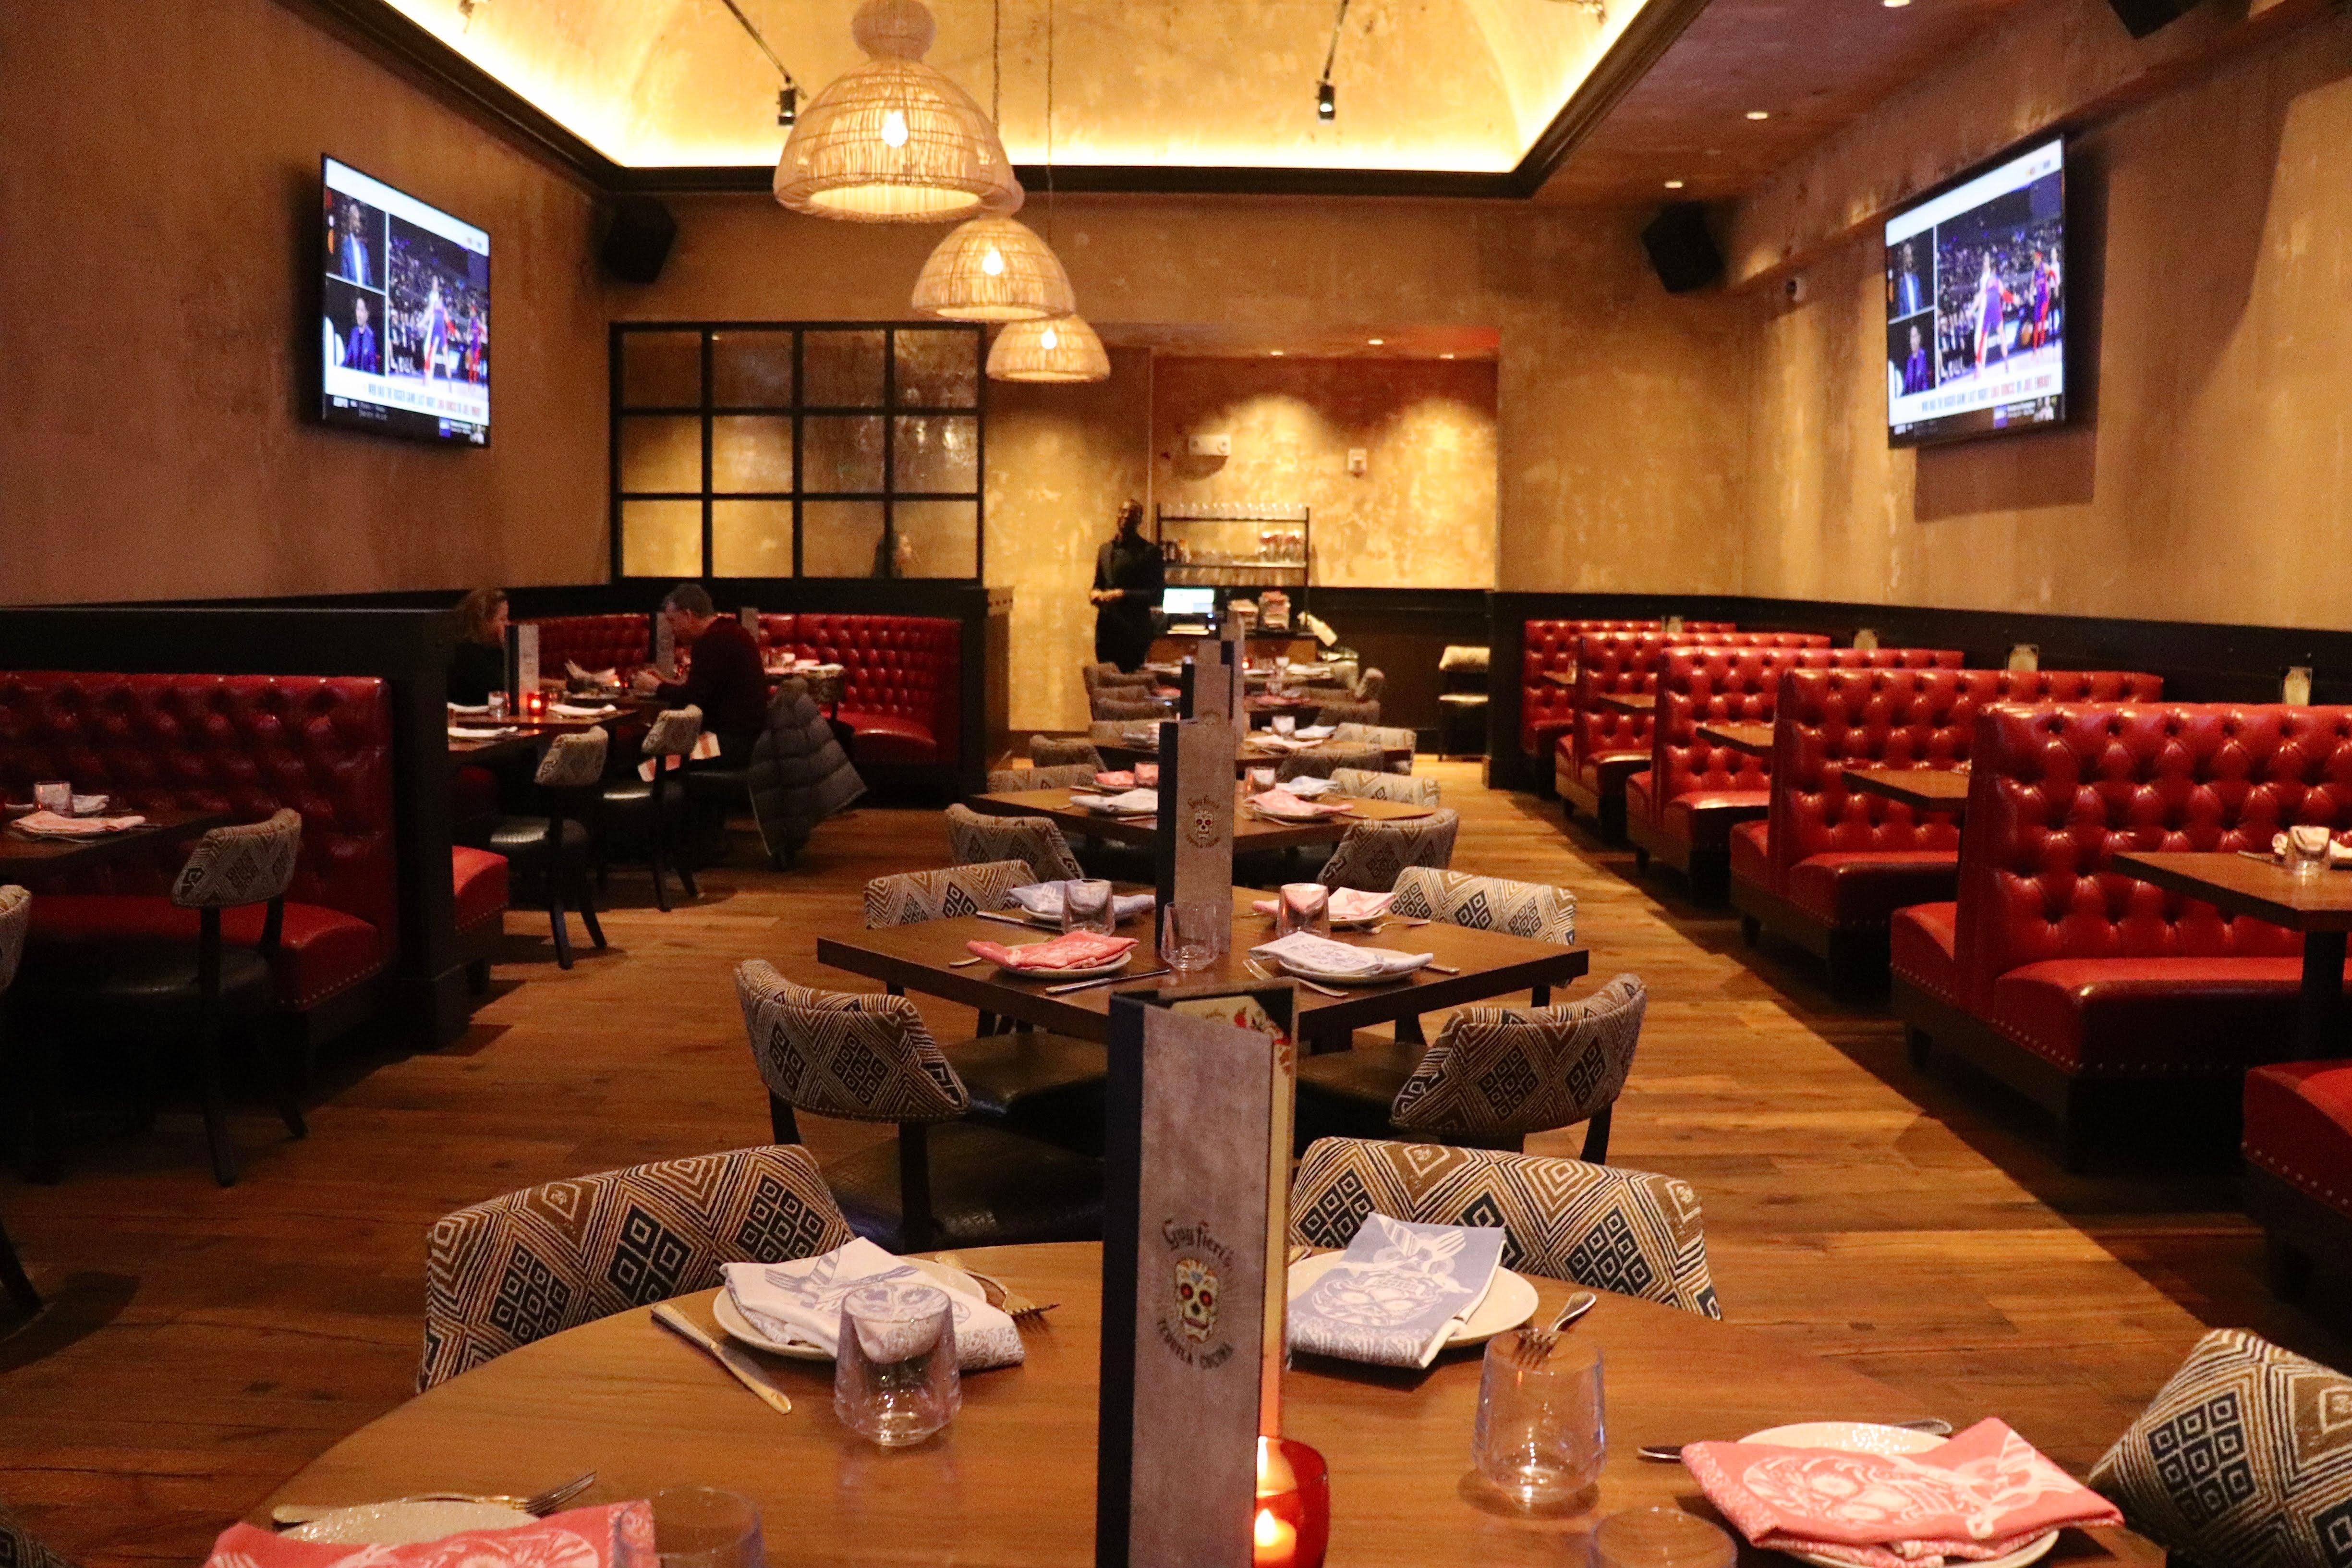 Guy Fieri's Tequila Cocina dining area